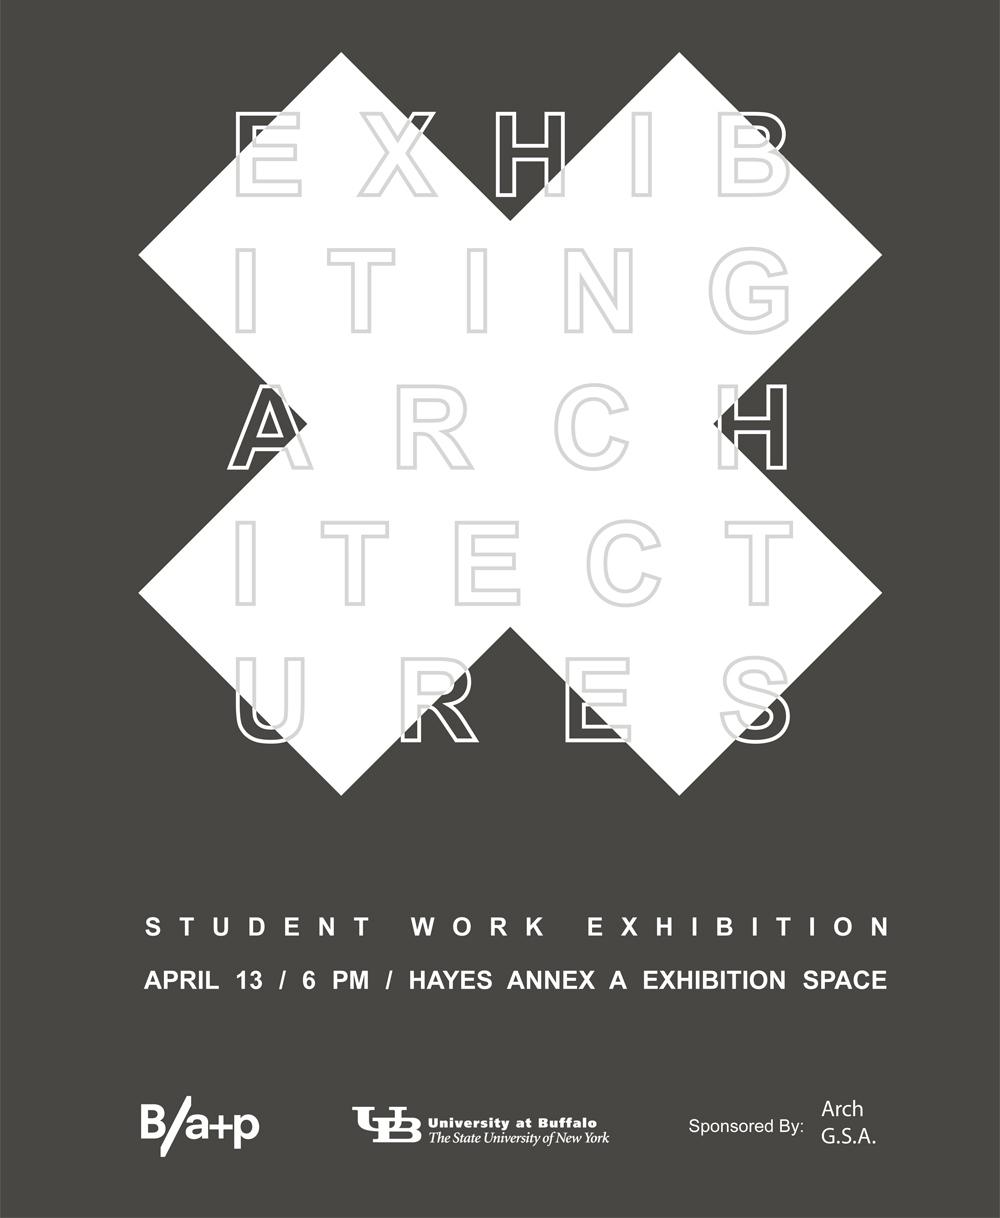 2016.03.17_Poster Exhibit_SM.jpg